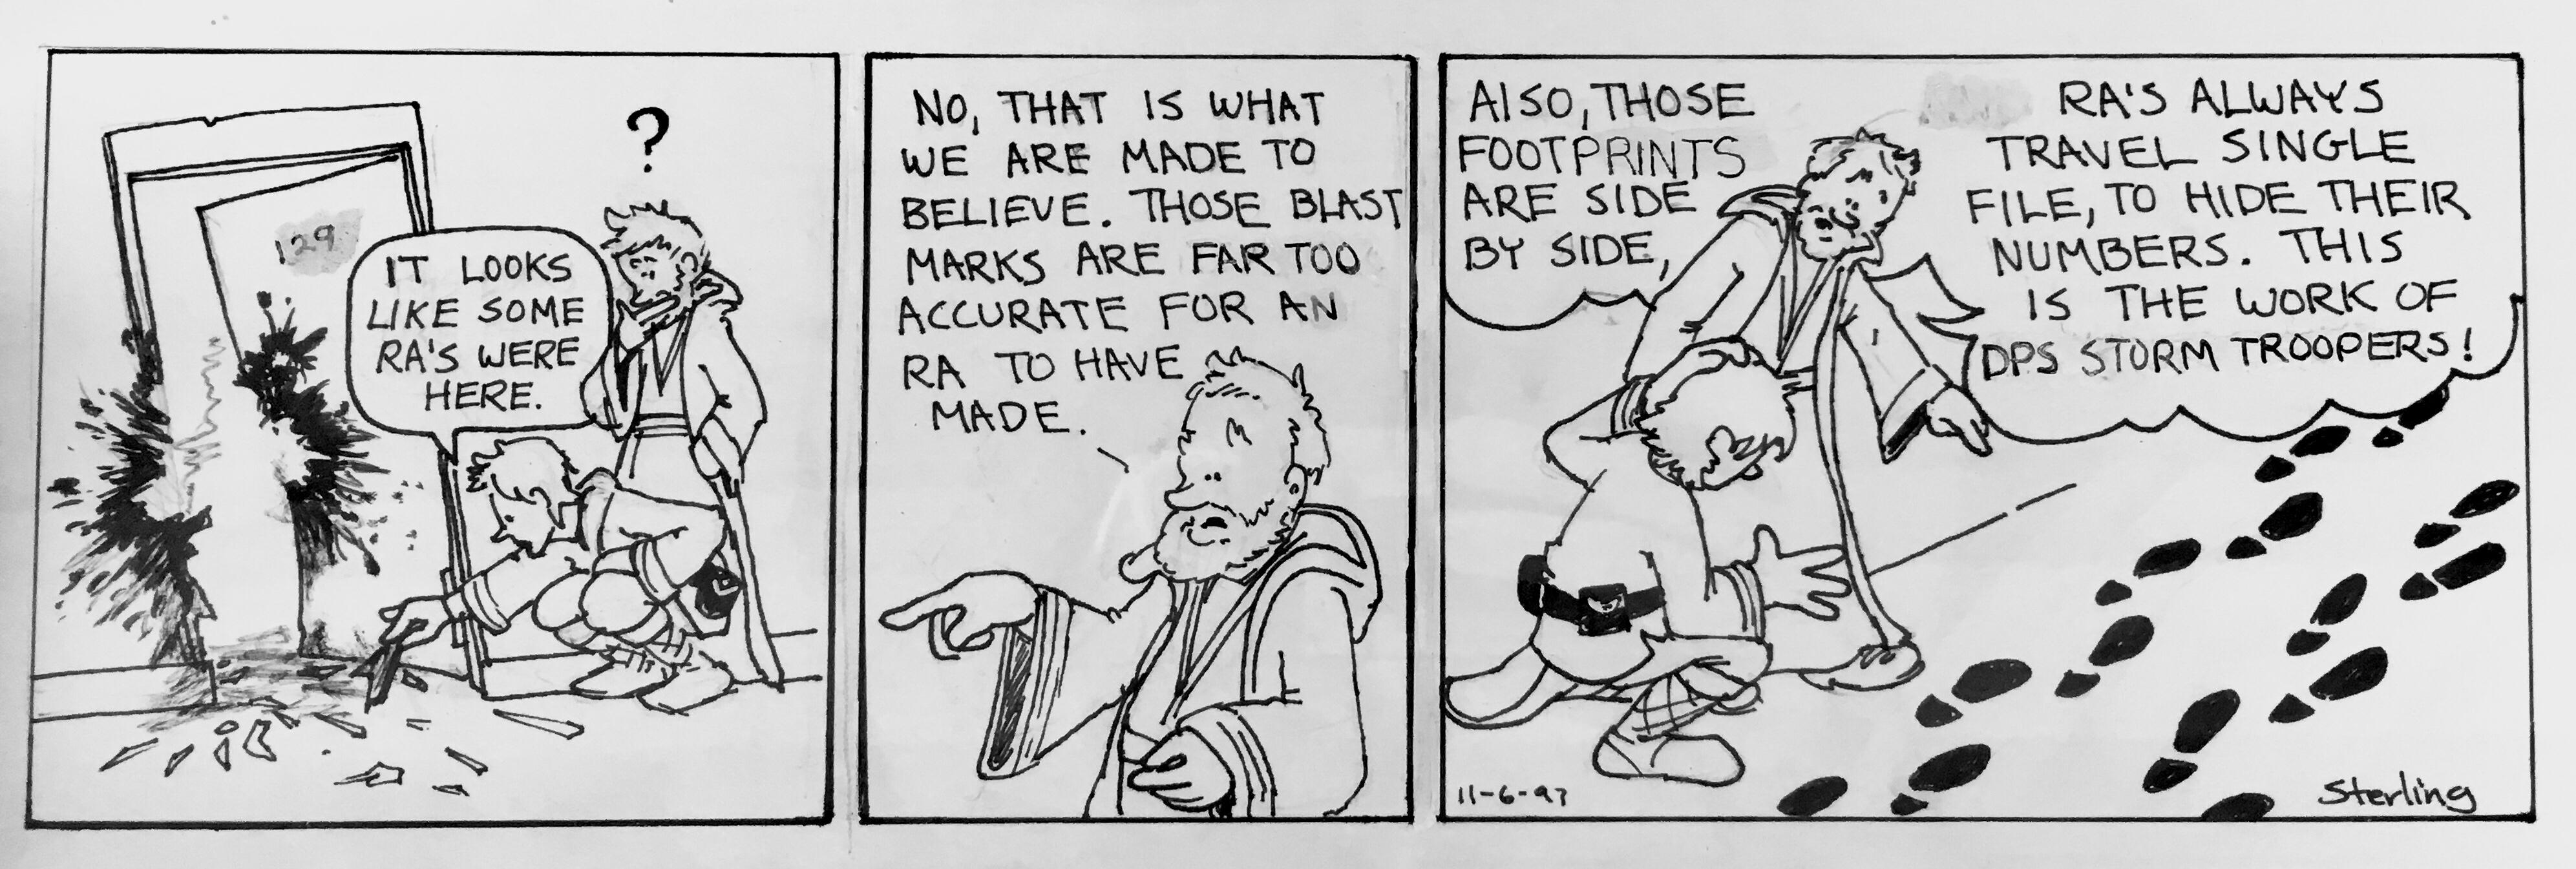 Luke and obi talk about blast marks